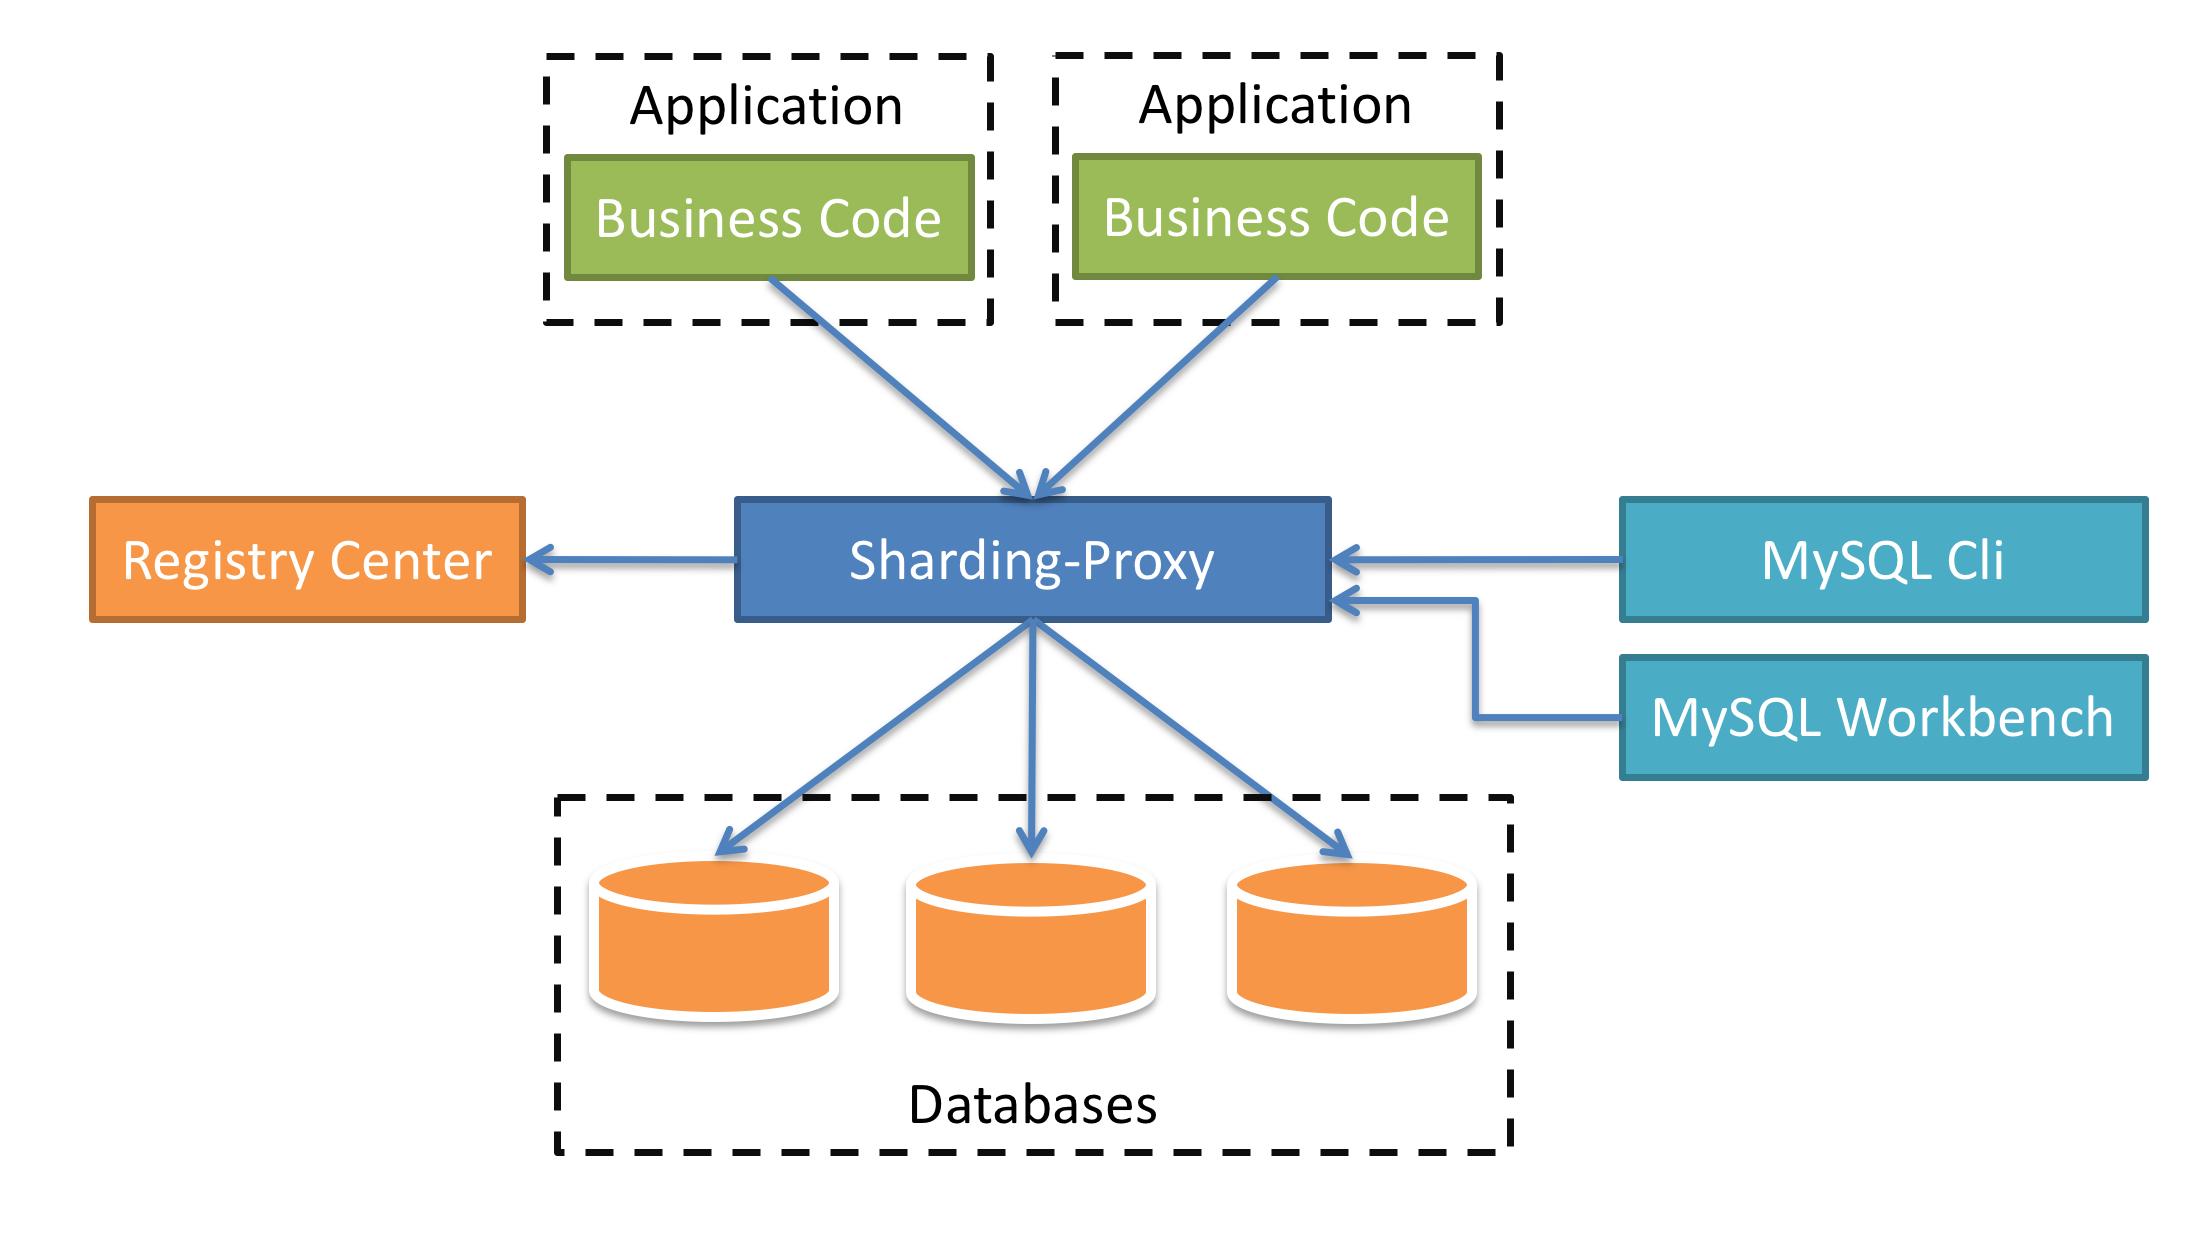 Sharding-Proxy Architecture